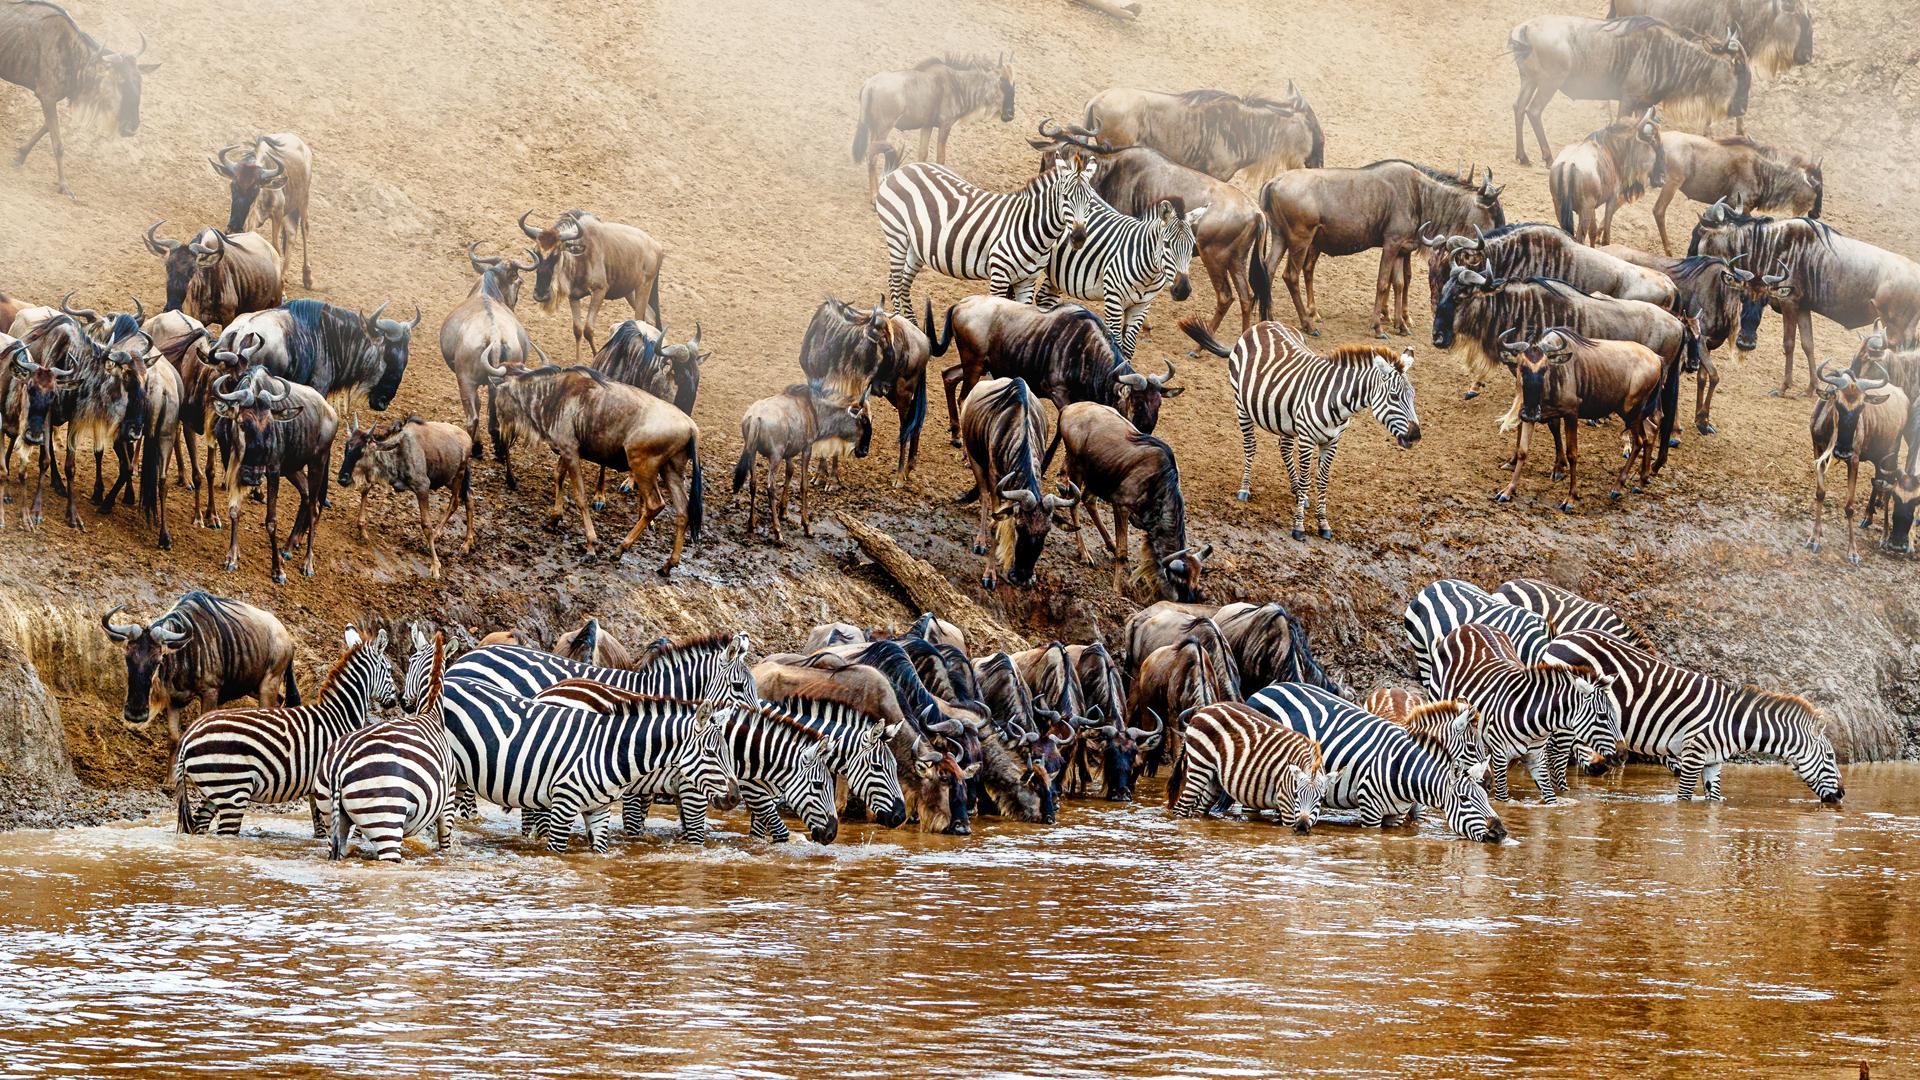 Kenya Great Wildebeest and Zebra Migration Scene.jpg